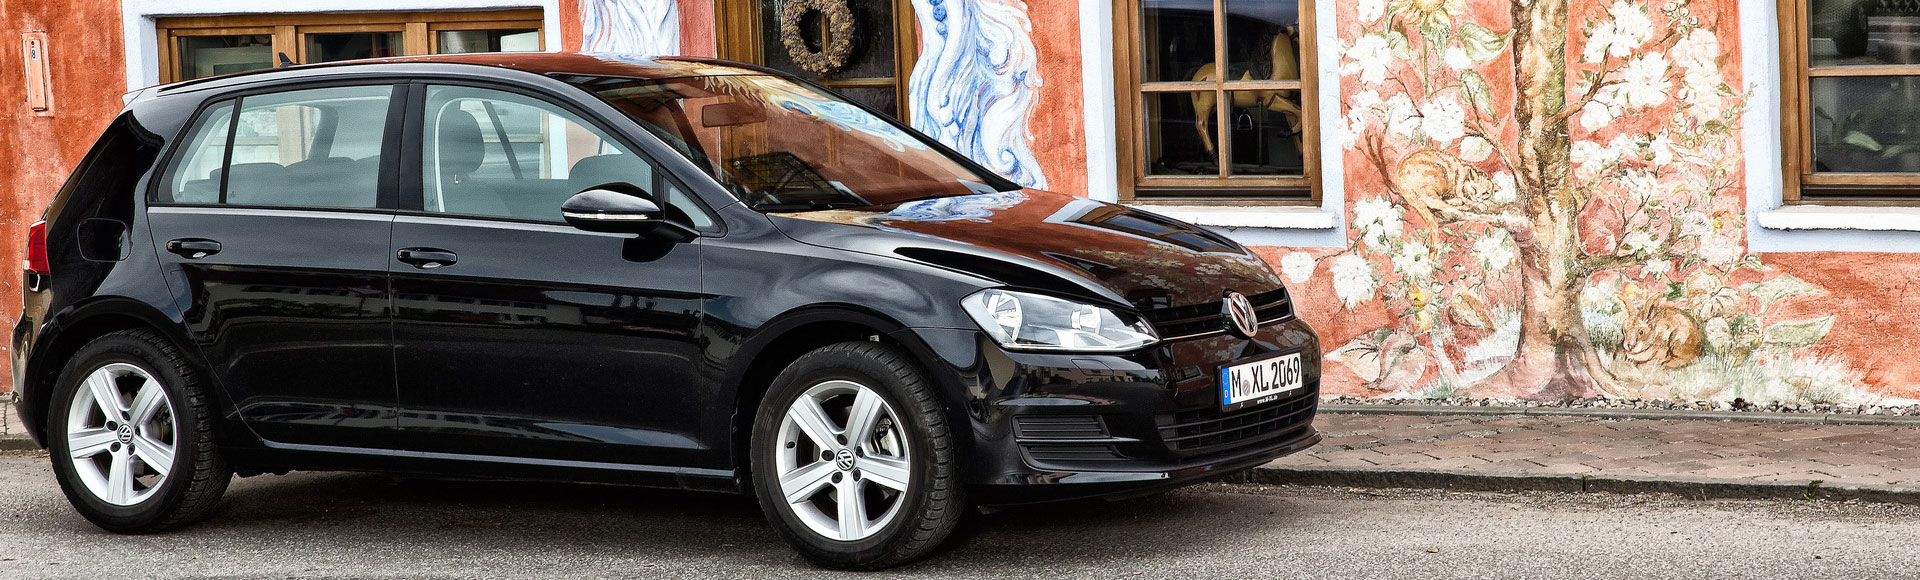 VW Golf 2013 30655